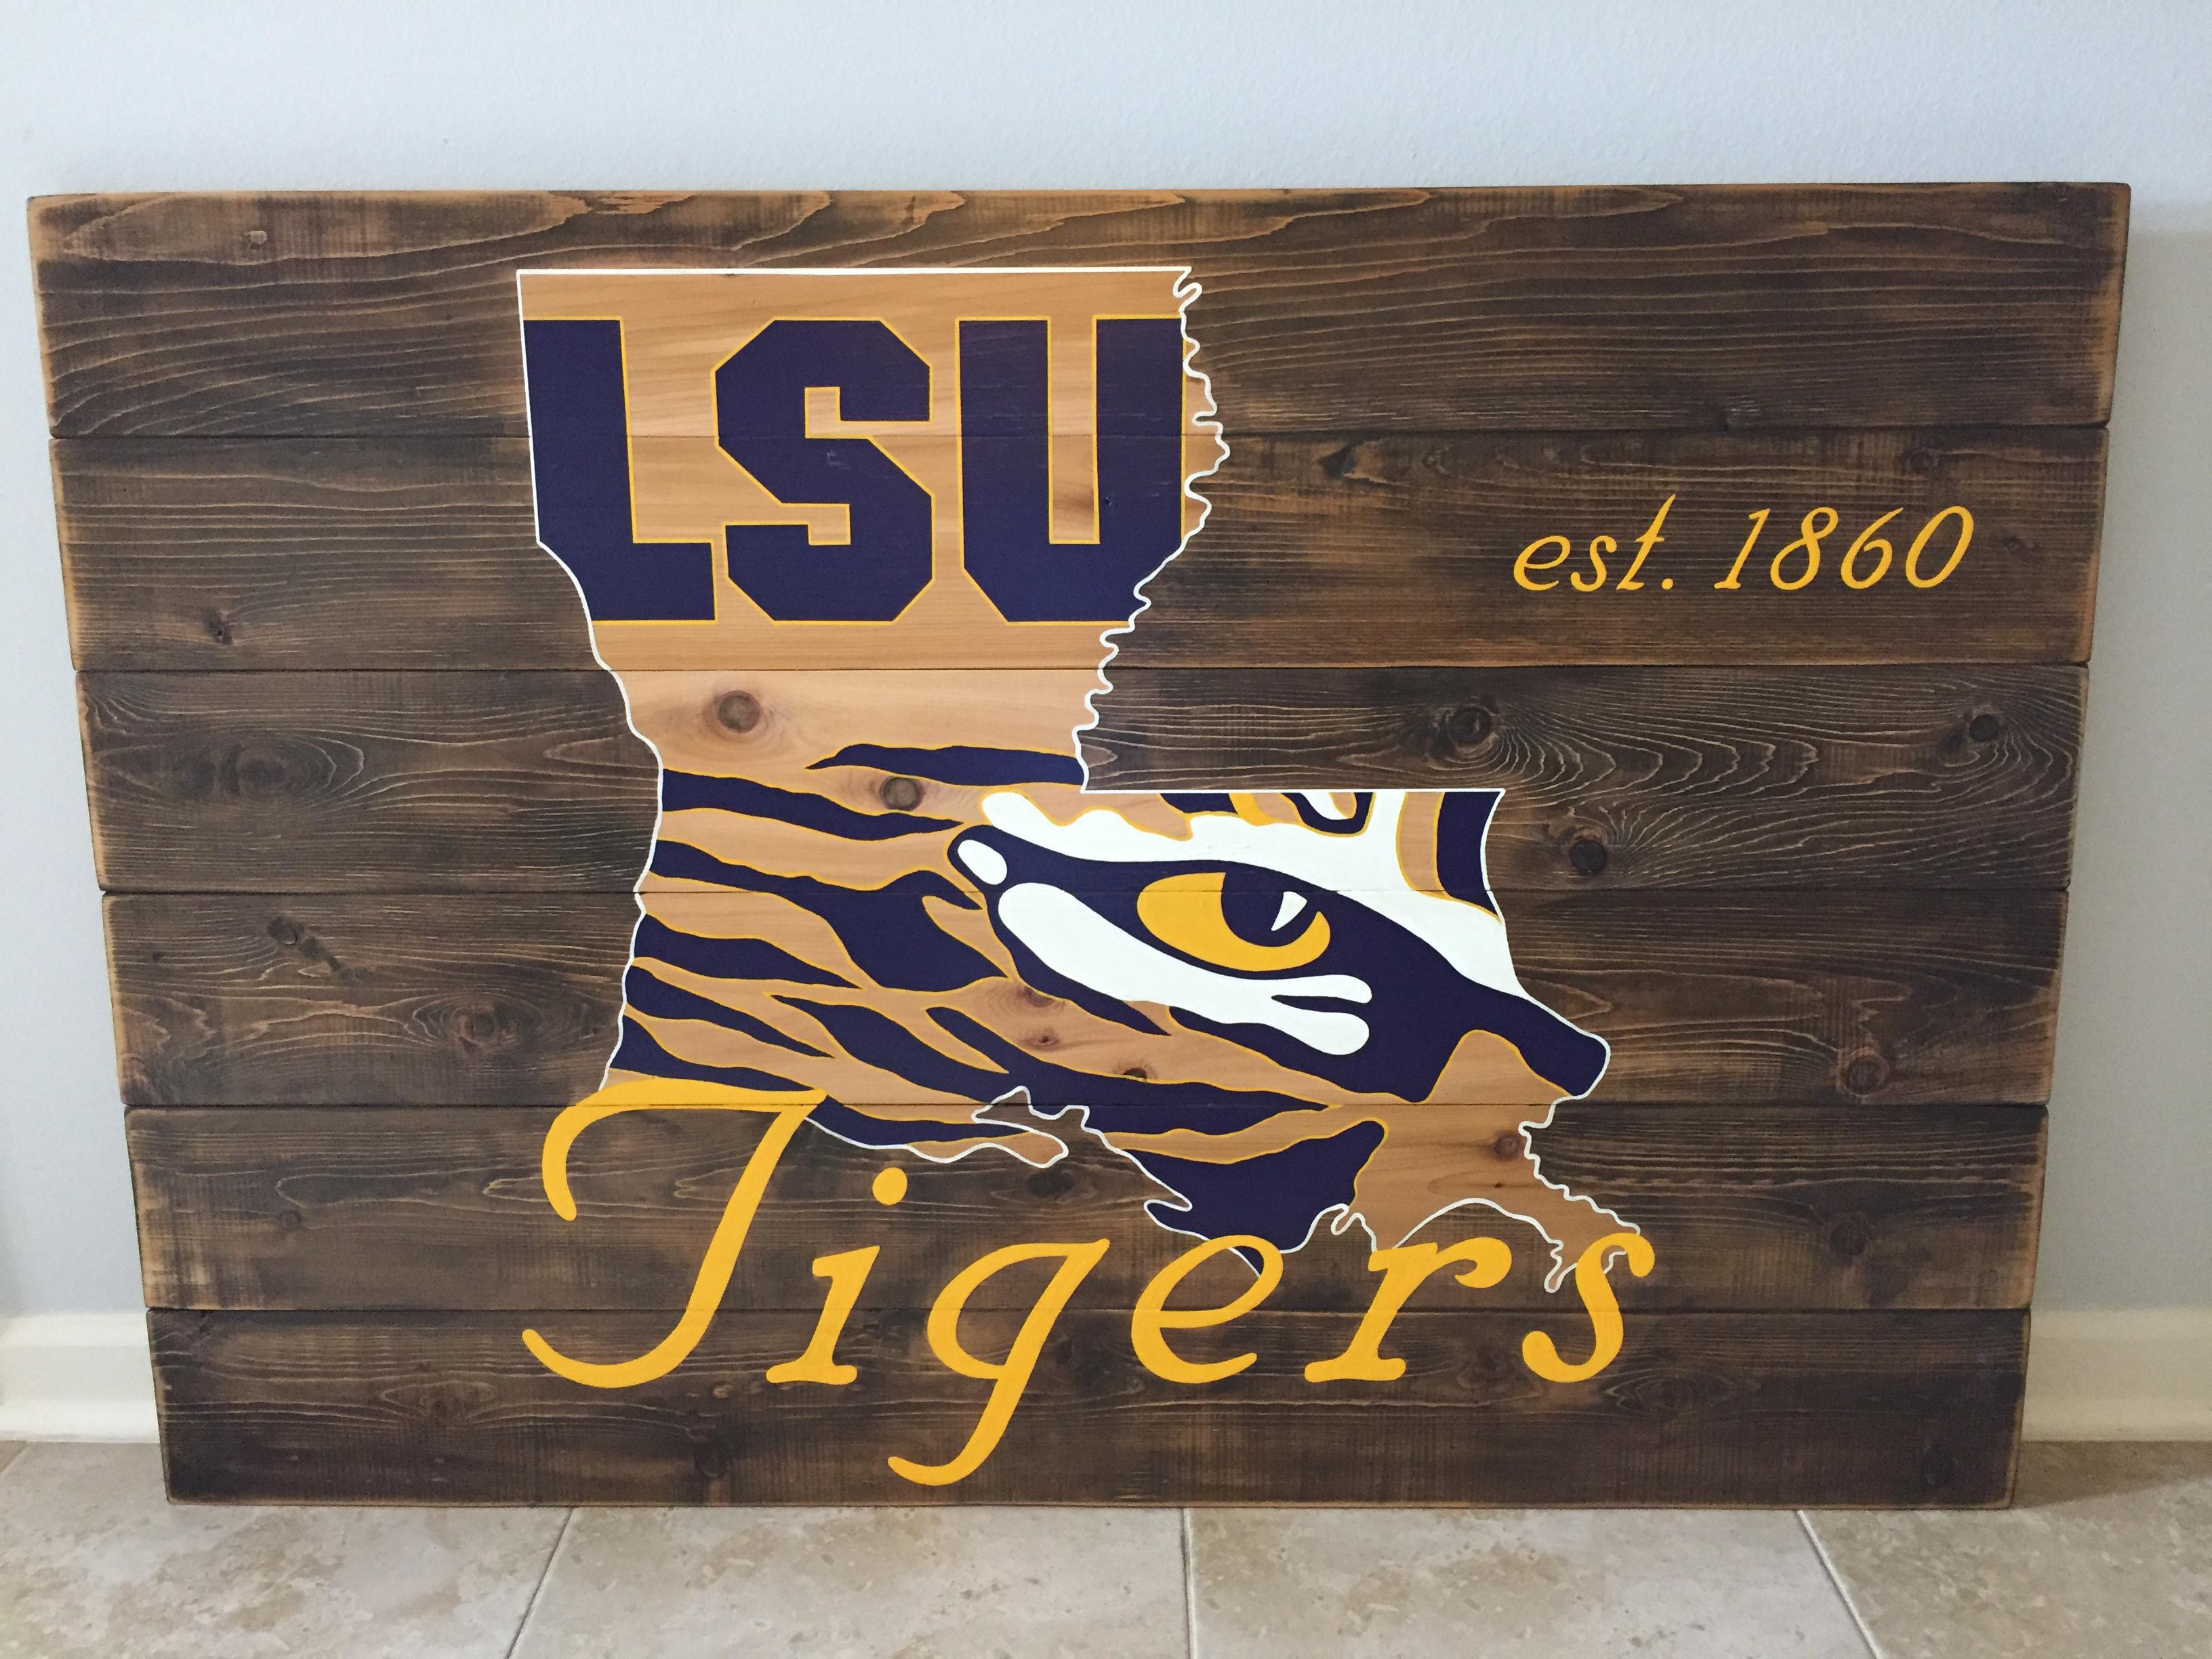 LSU Tigers sign